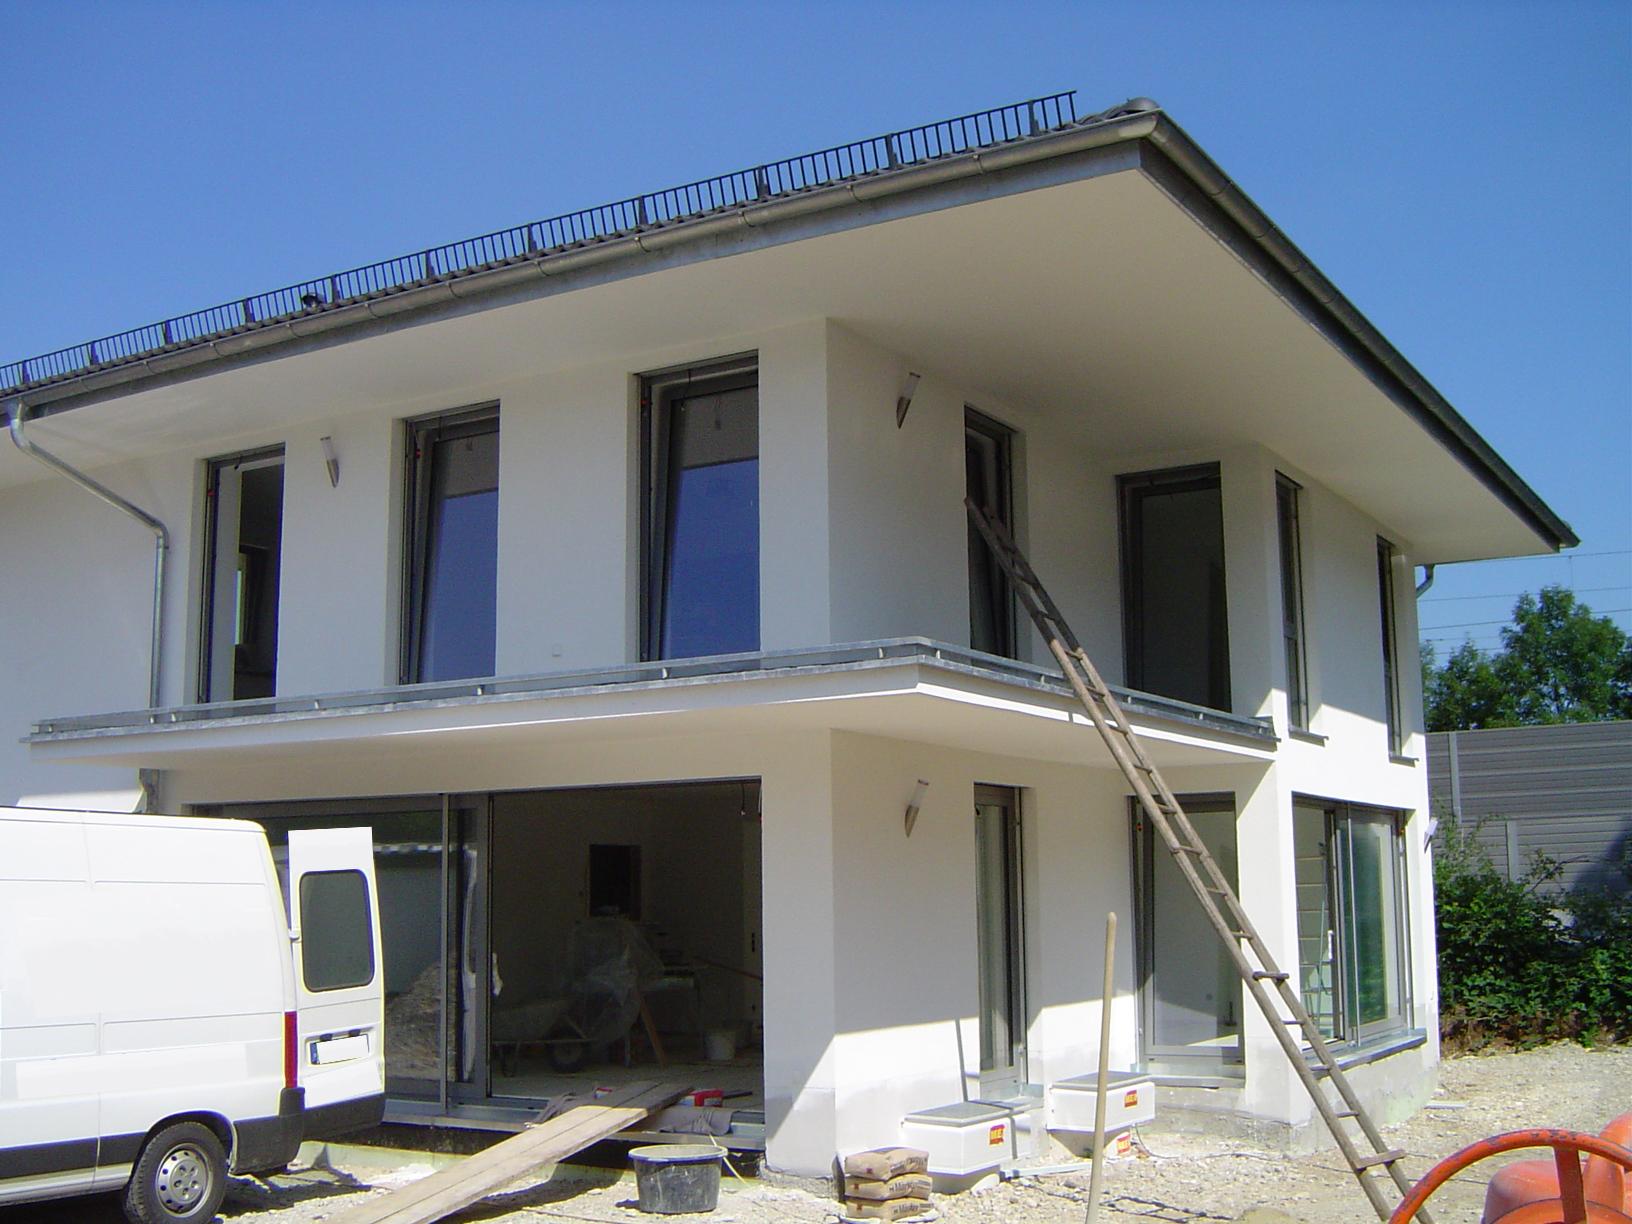 einfamilienhaus m nchen obermenzing ostermeier heigl. Black Bedroom Furniture Sets. Home Design Ideas